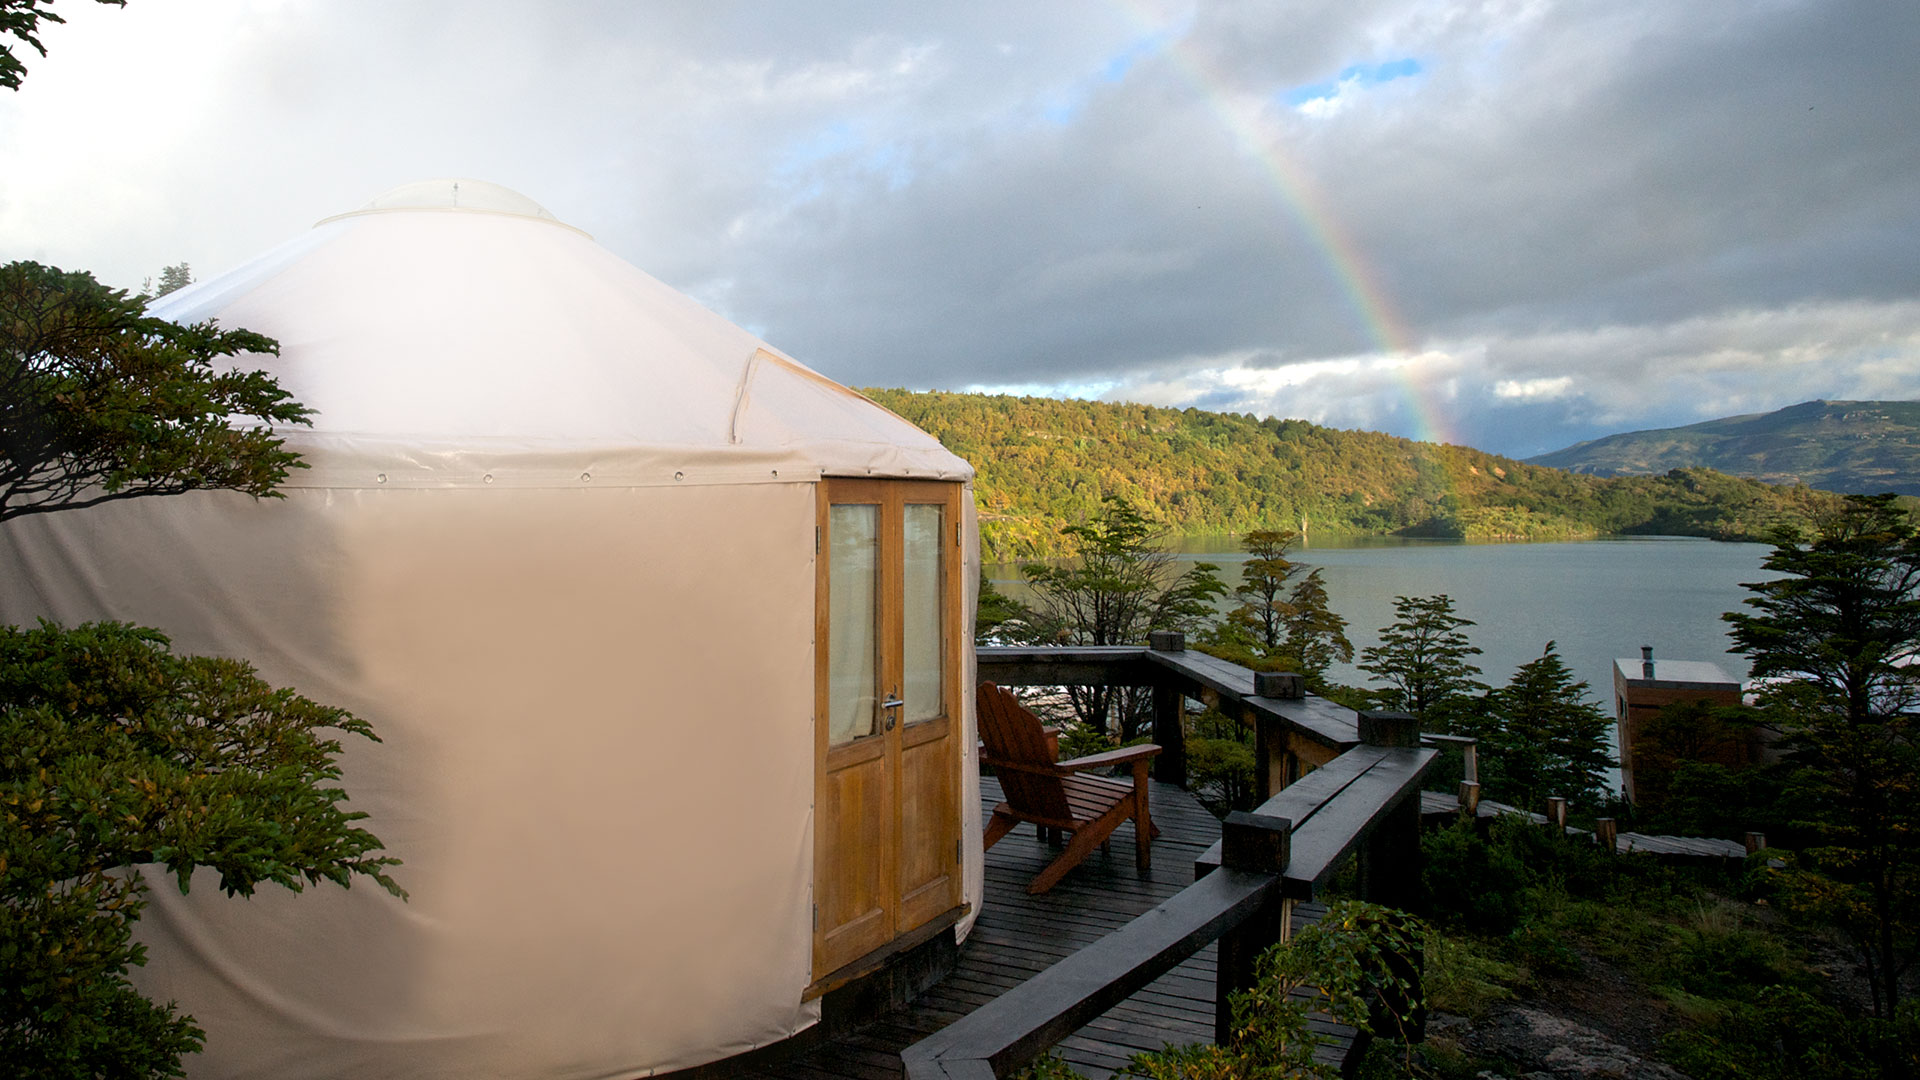 Patagonia Camp yurt overlooking Lago Toro, Torres del Paine, Chile